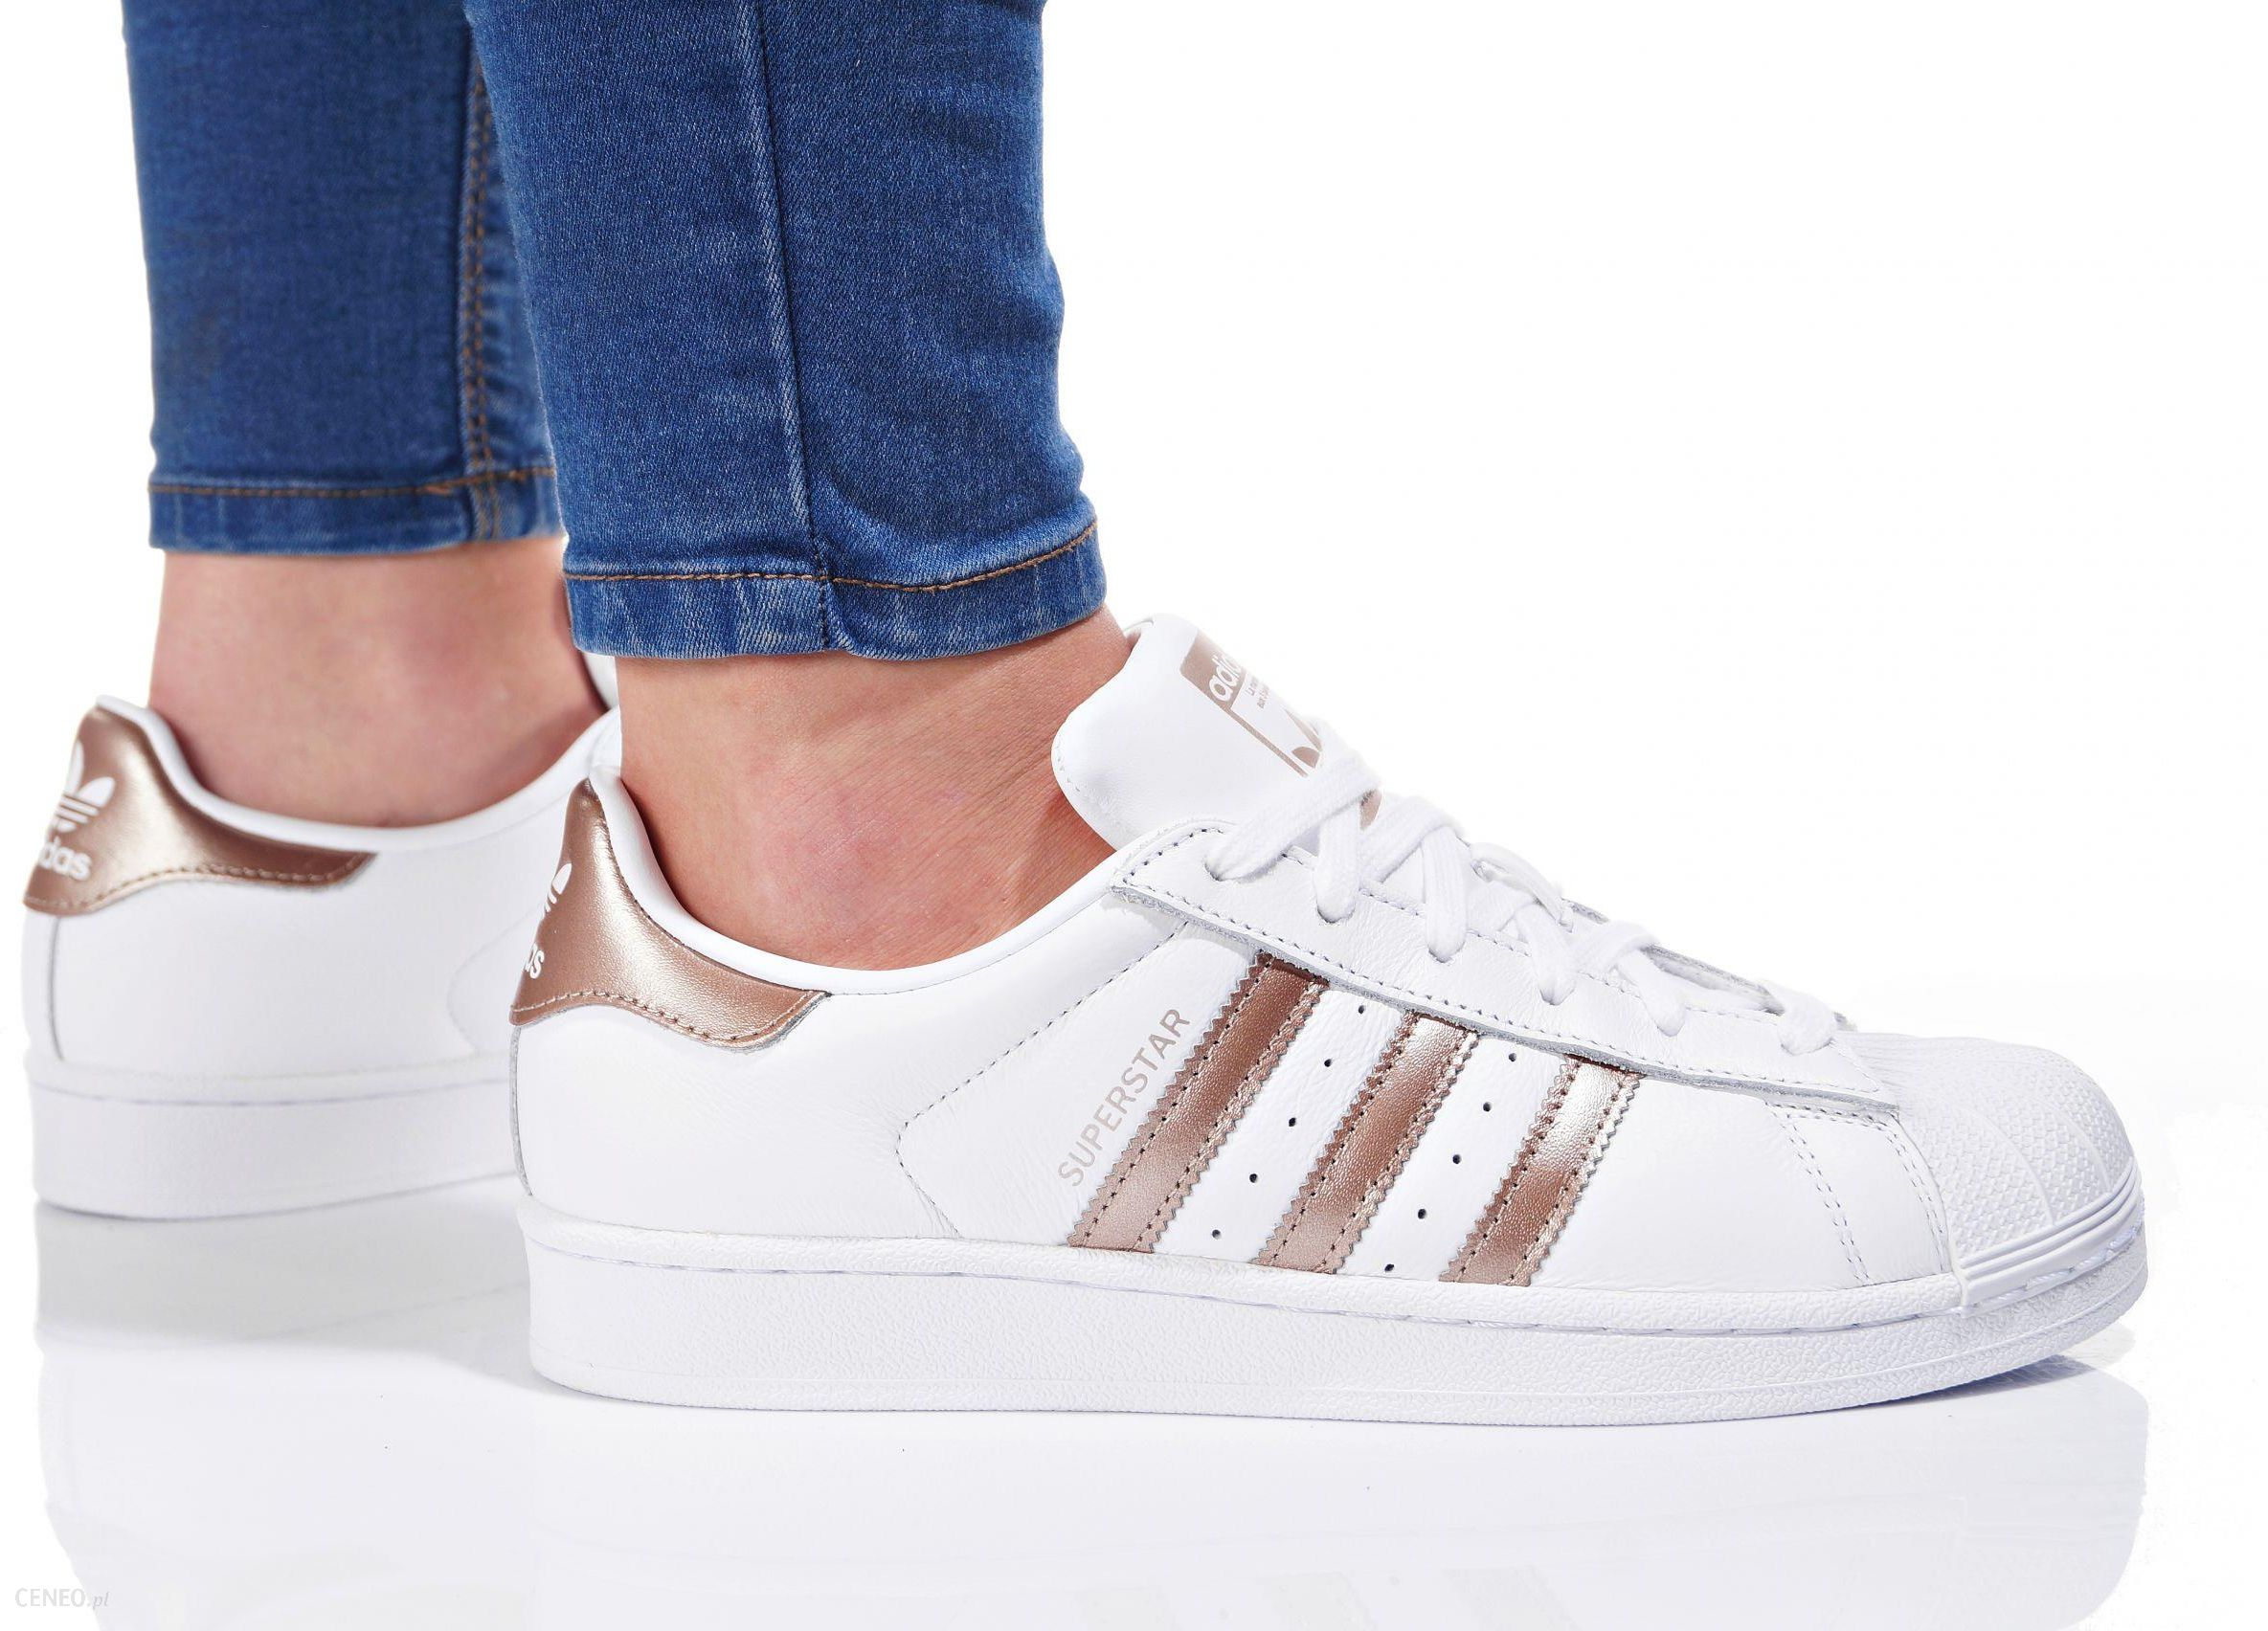 Adidas Superstar W CG5463